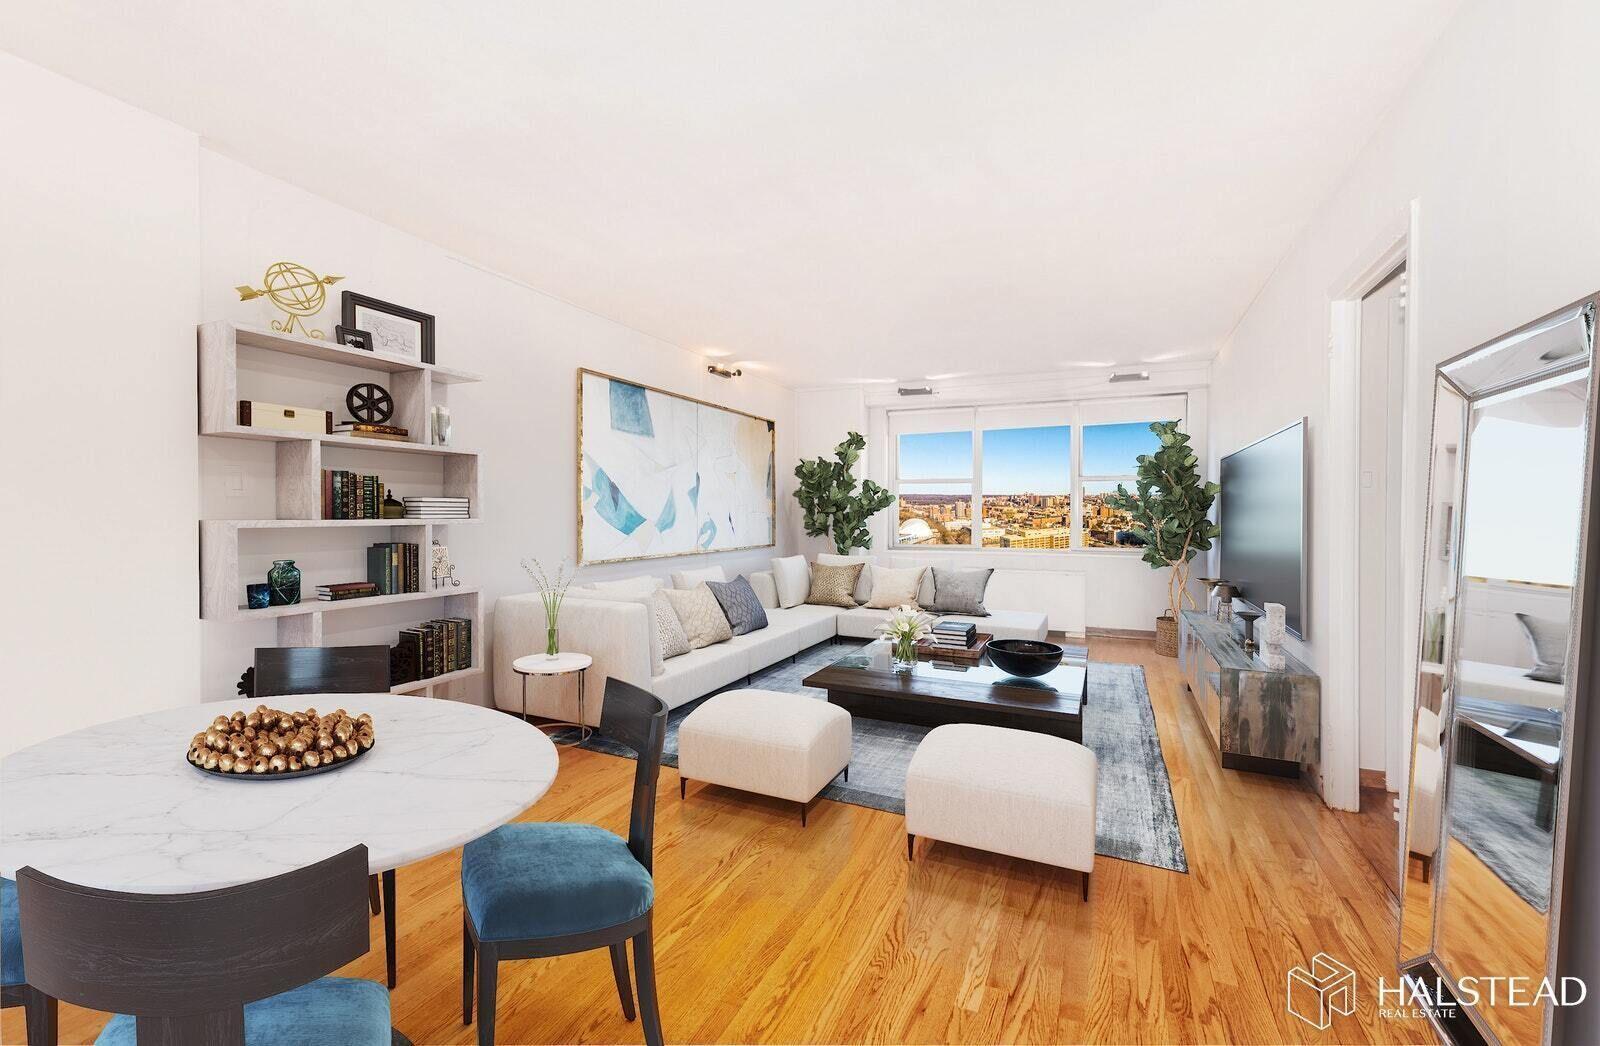 Apartment for sale at 2500 Johnson Avenue, Apt 21B